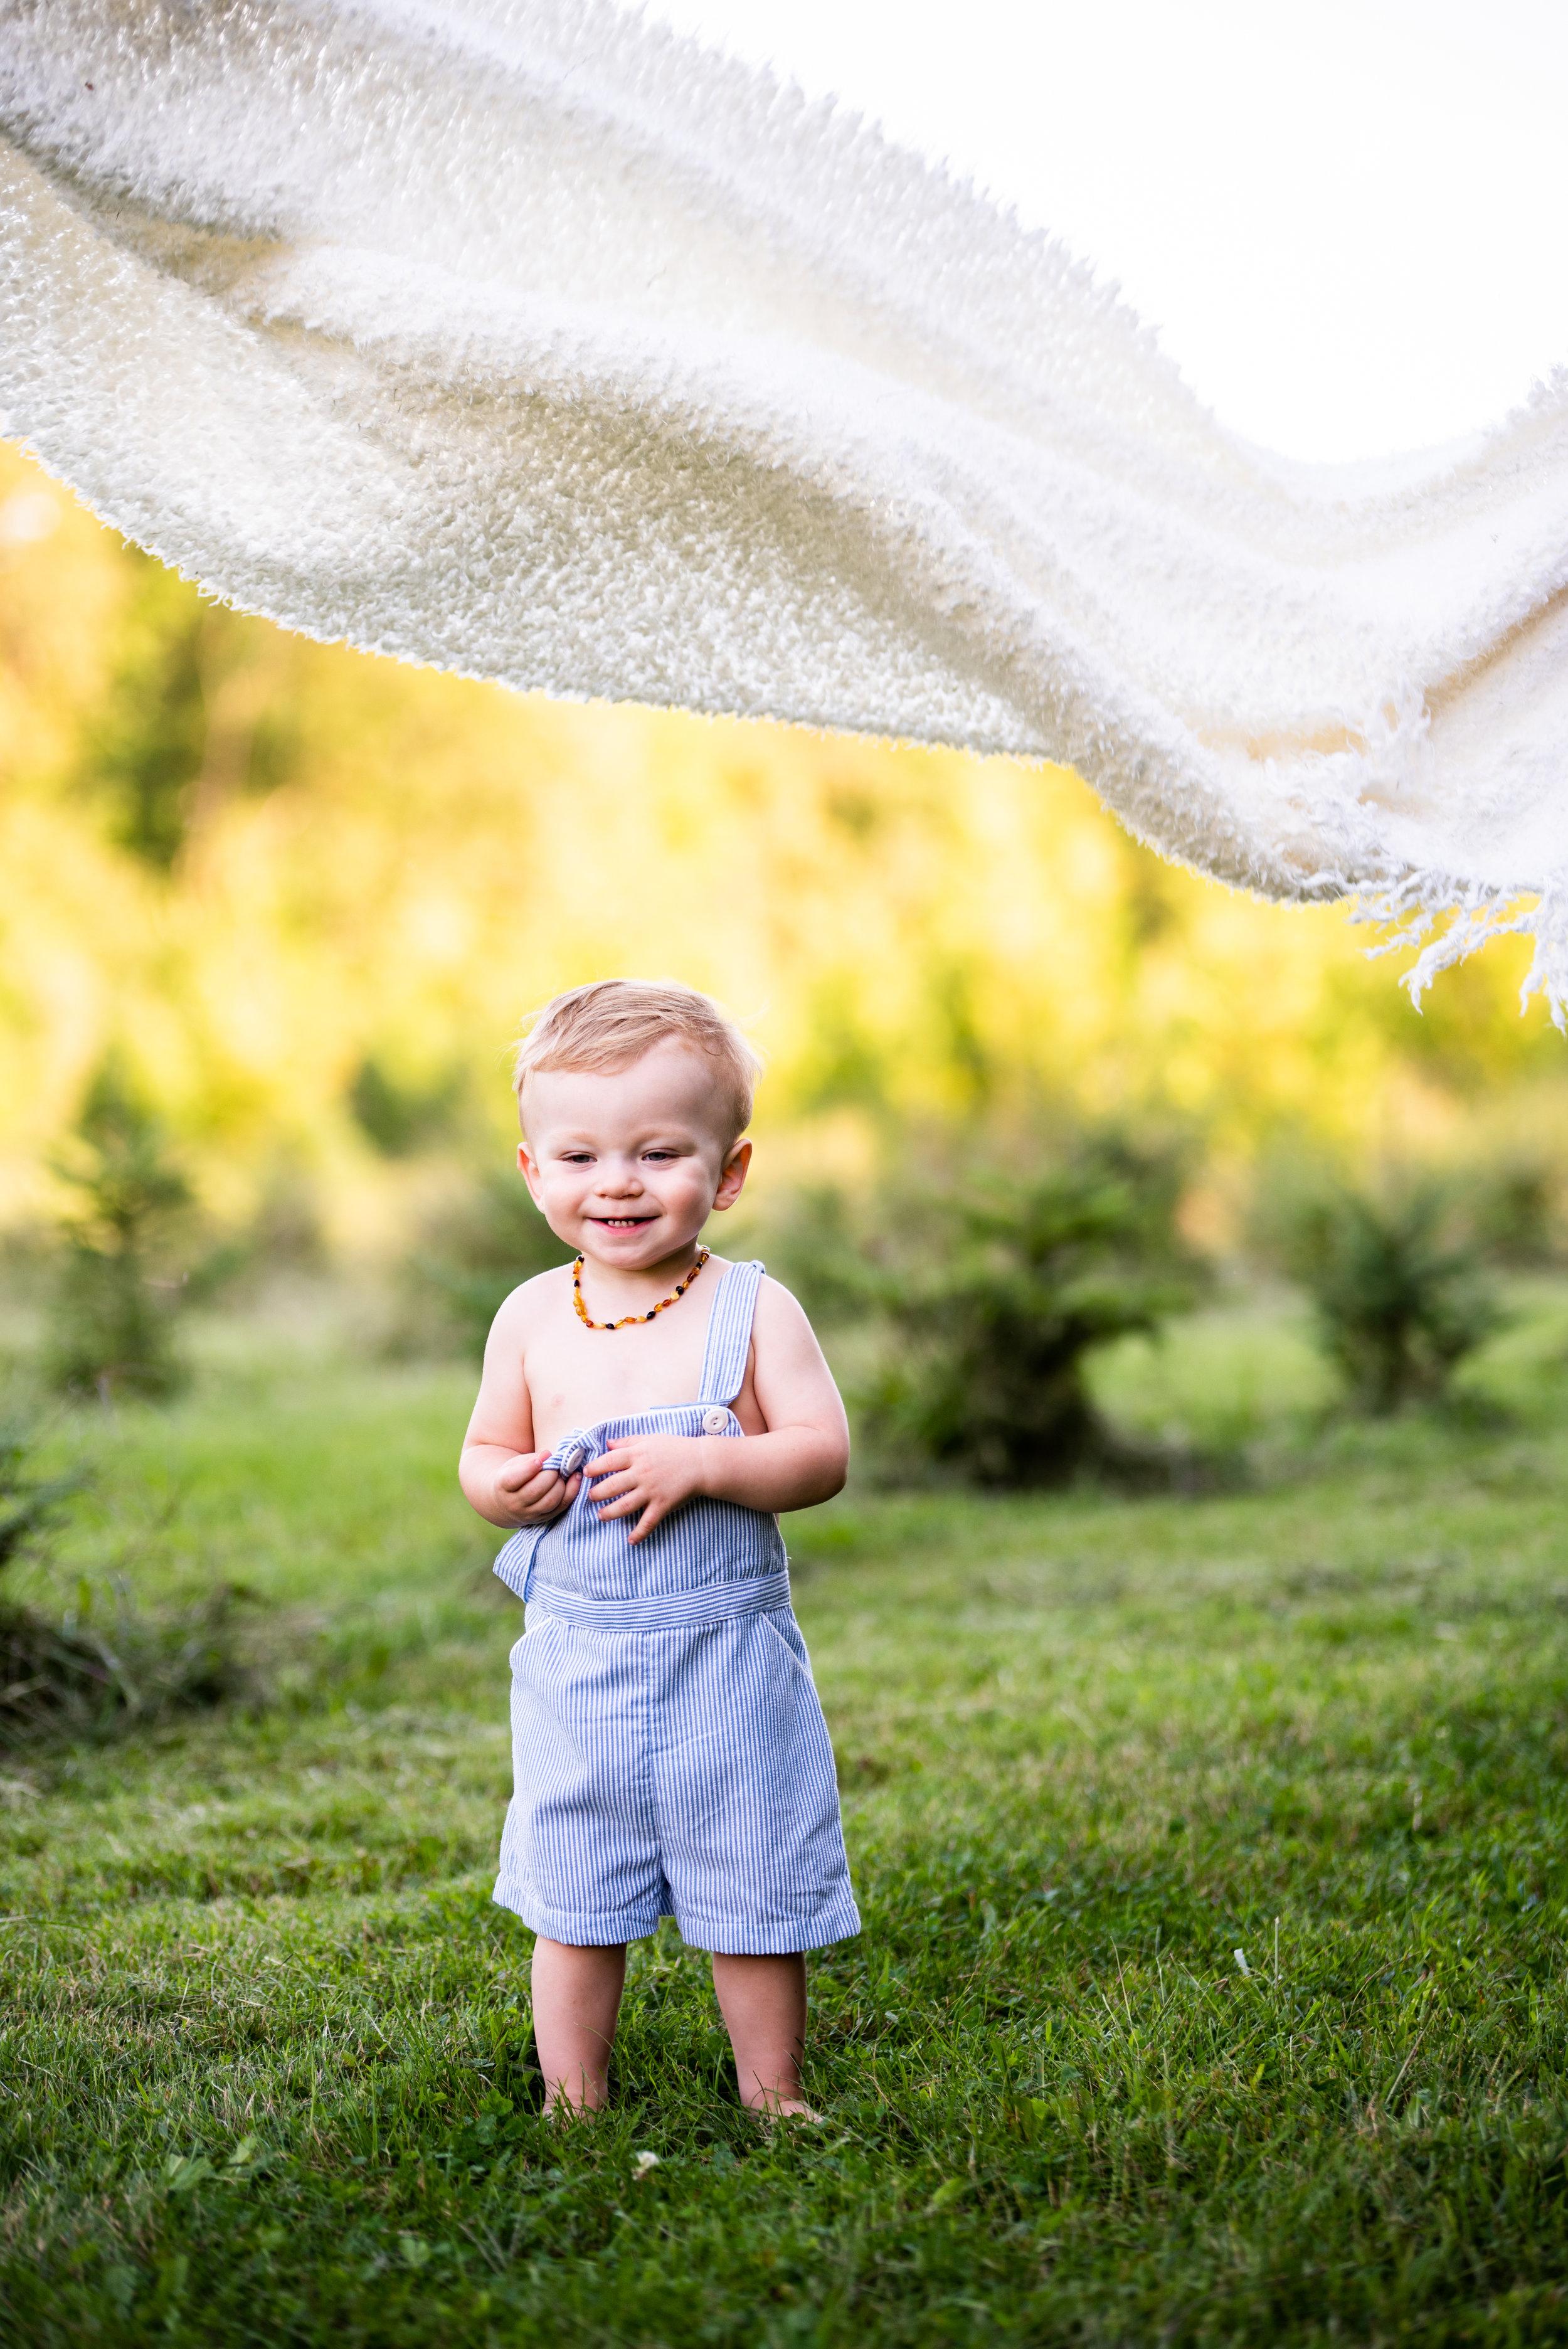 Kyla Jo Photography Muncie Indiana Playful children Poses